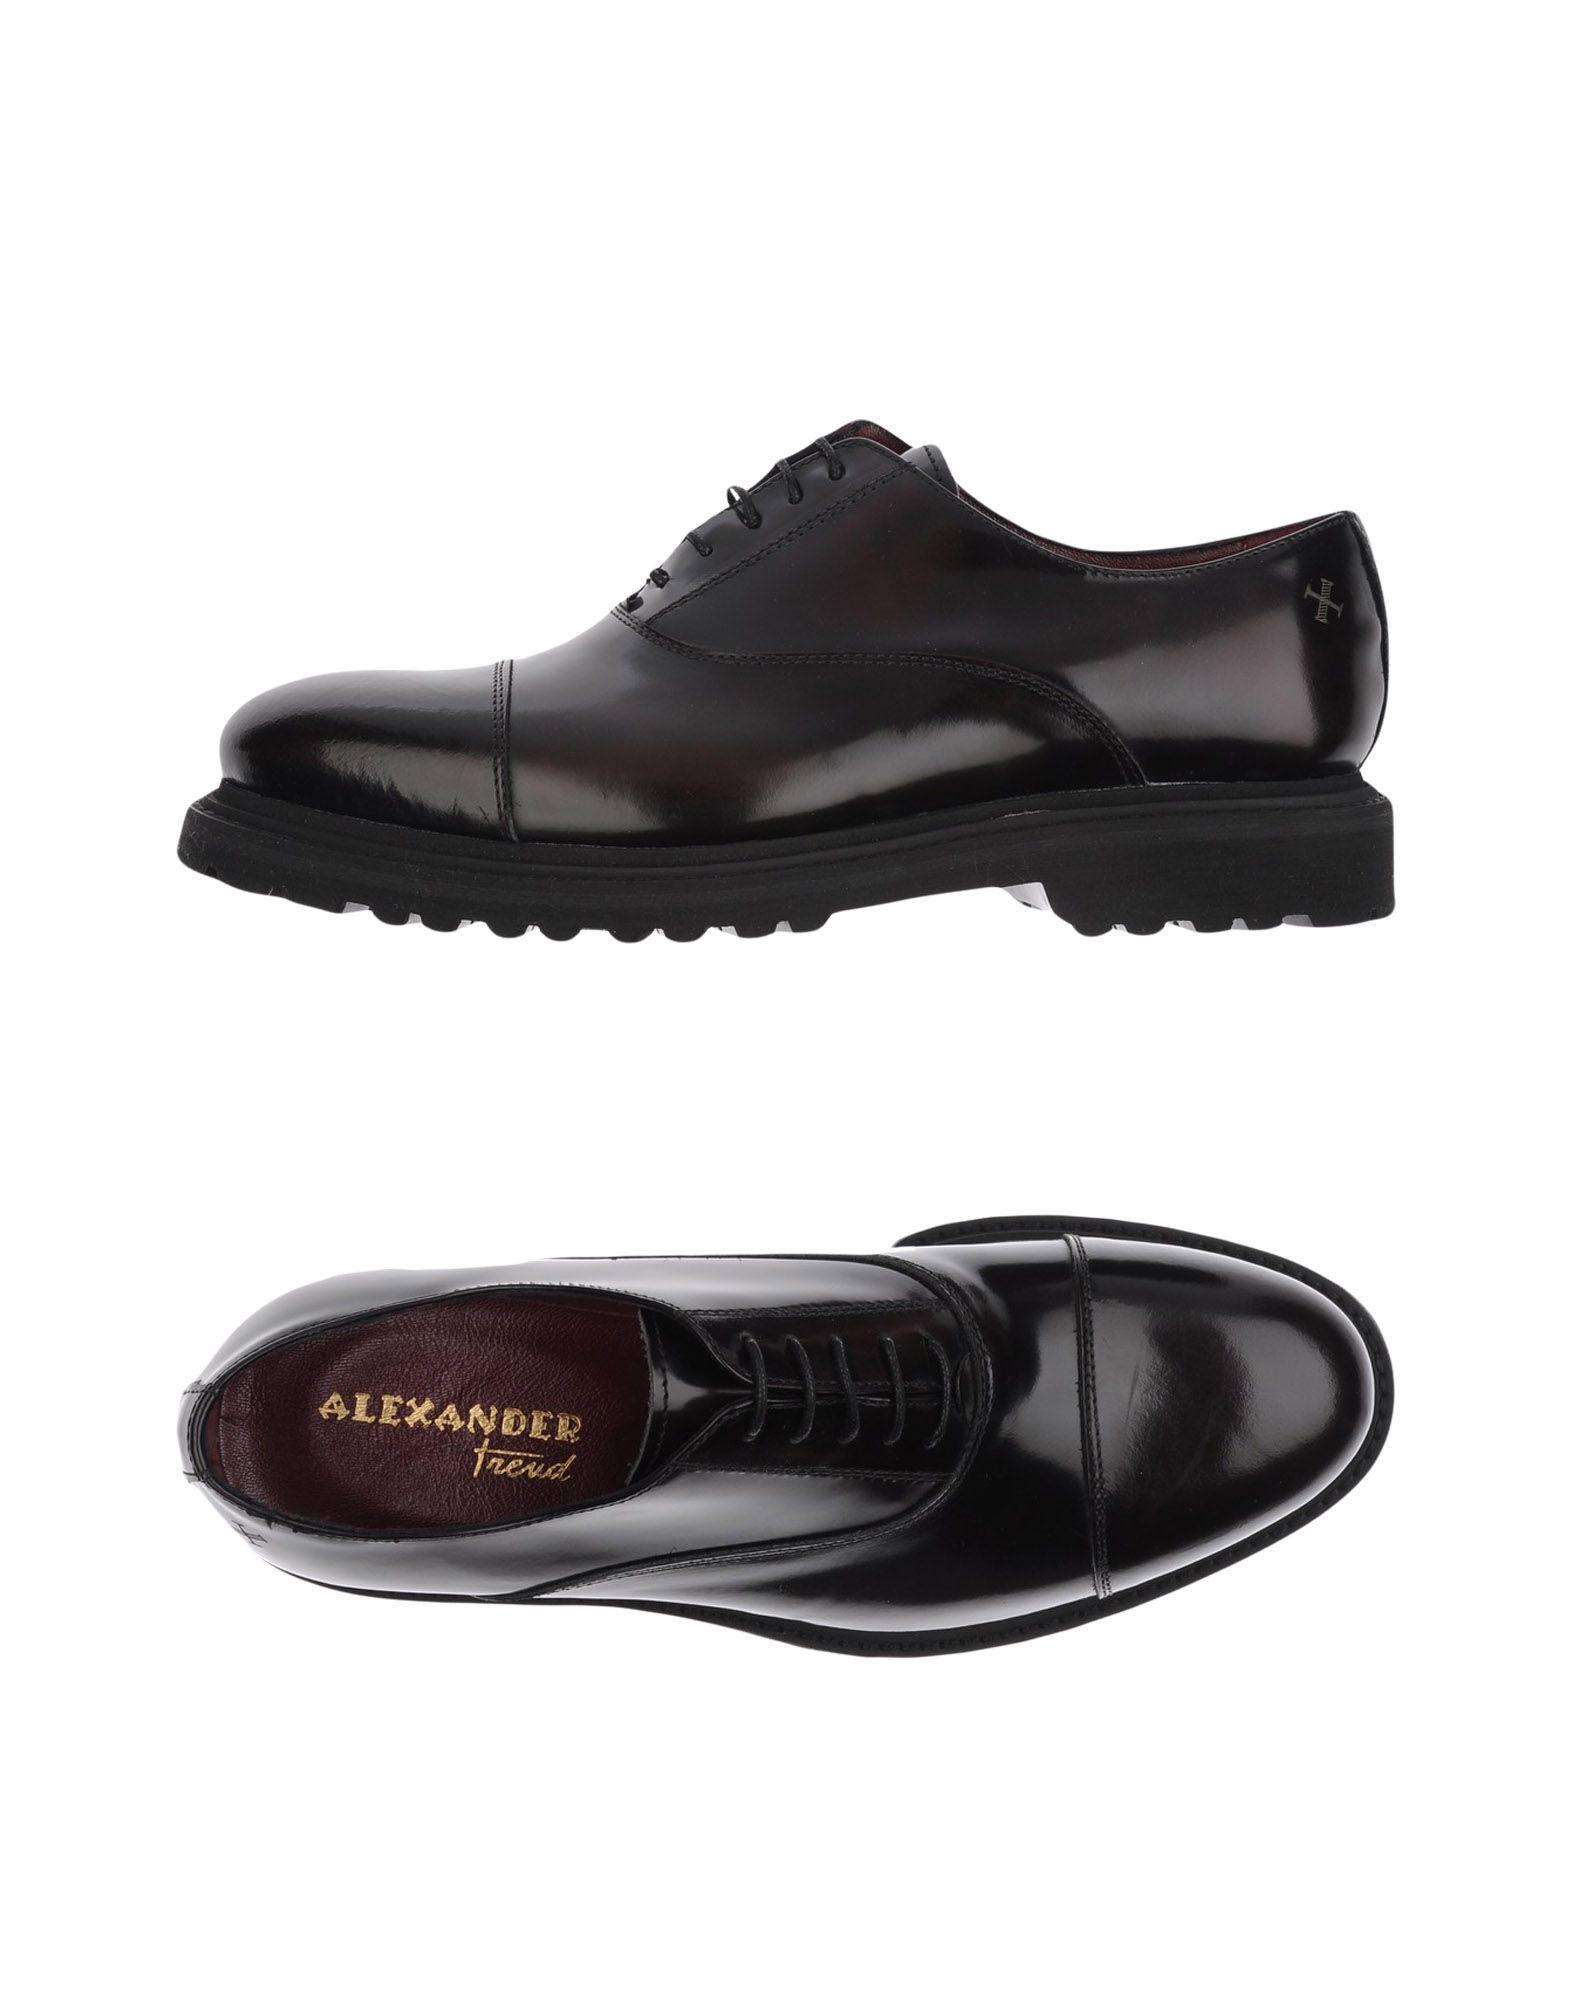 Rabatt echte Schuhe Alexander Trend Schnürschuhe Herren  11235953FM